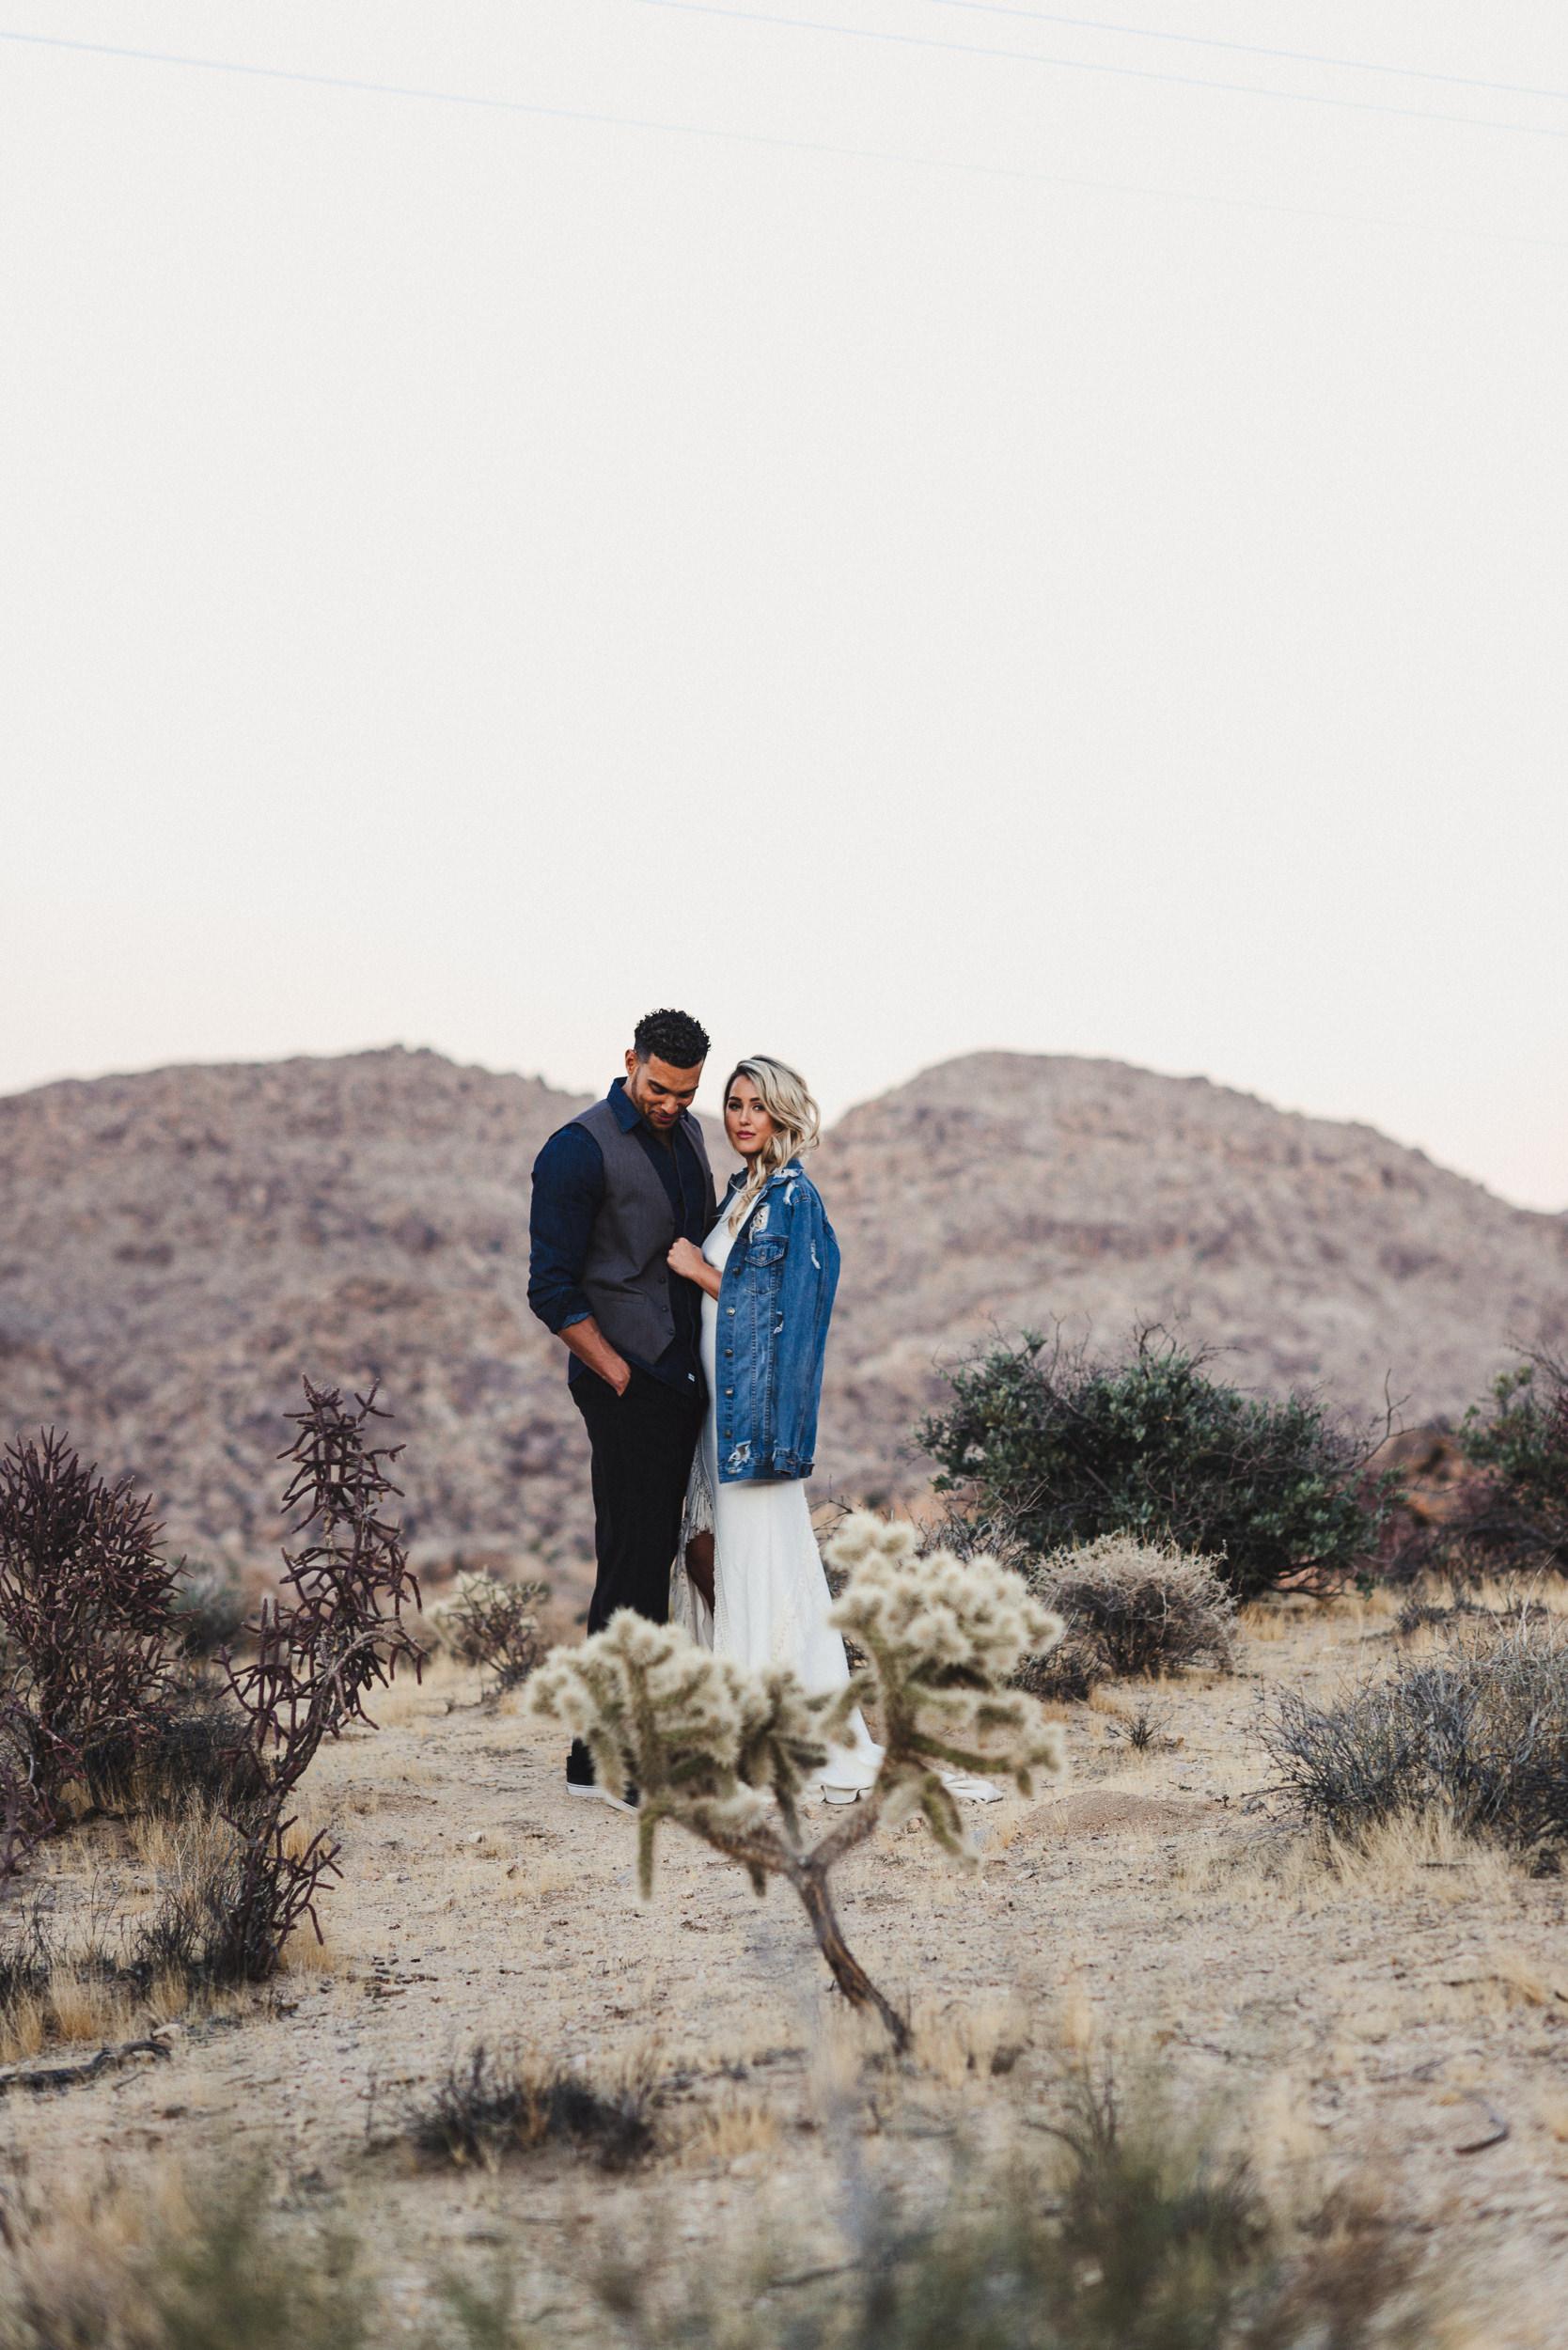 sKarlee + Jamall - Engagement Shoot, Joshua Tree CA-83.jpg